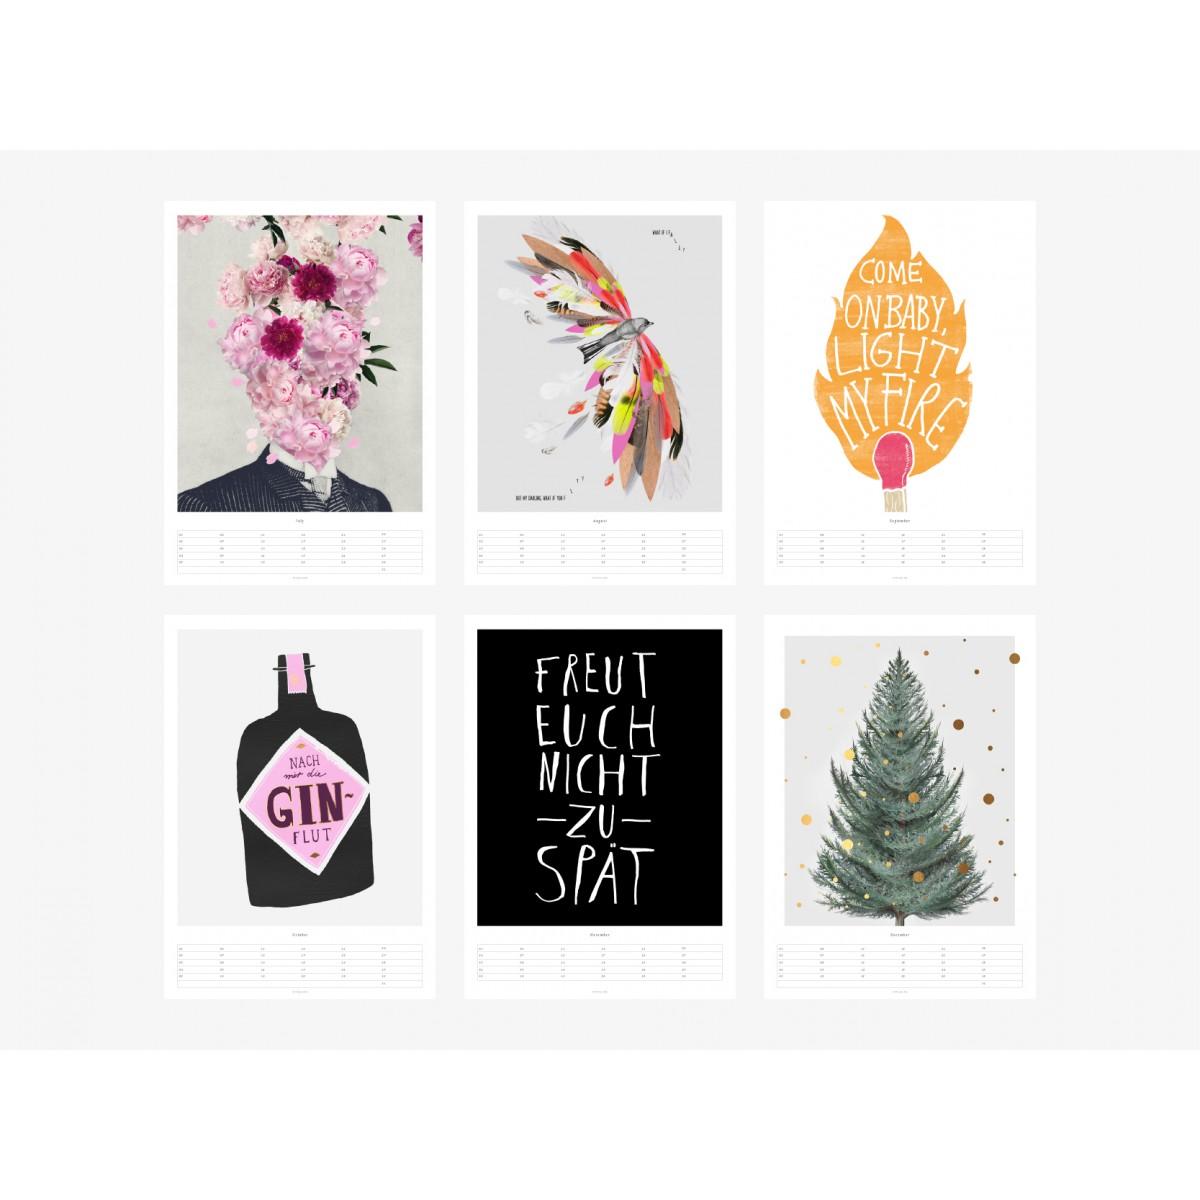 typealive / Wandkalender / Prints